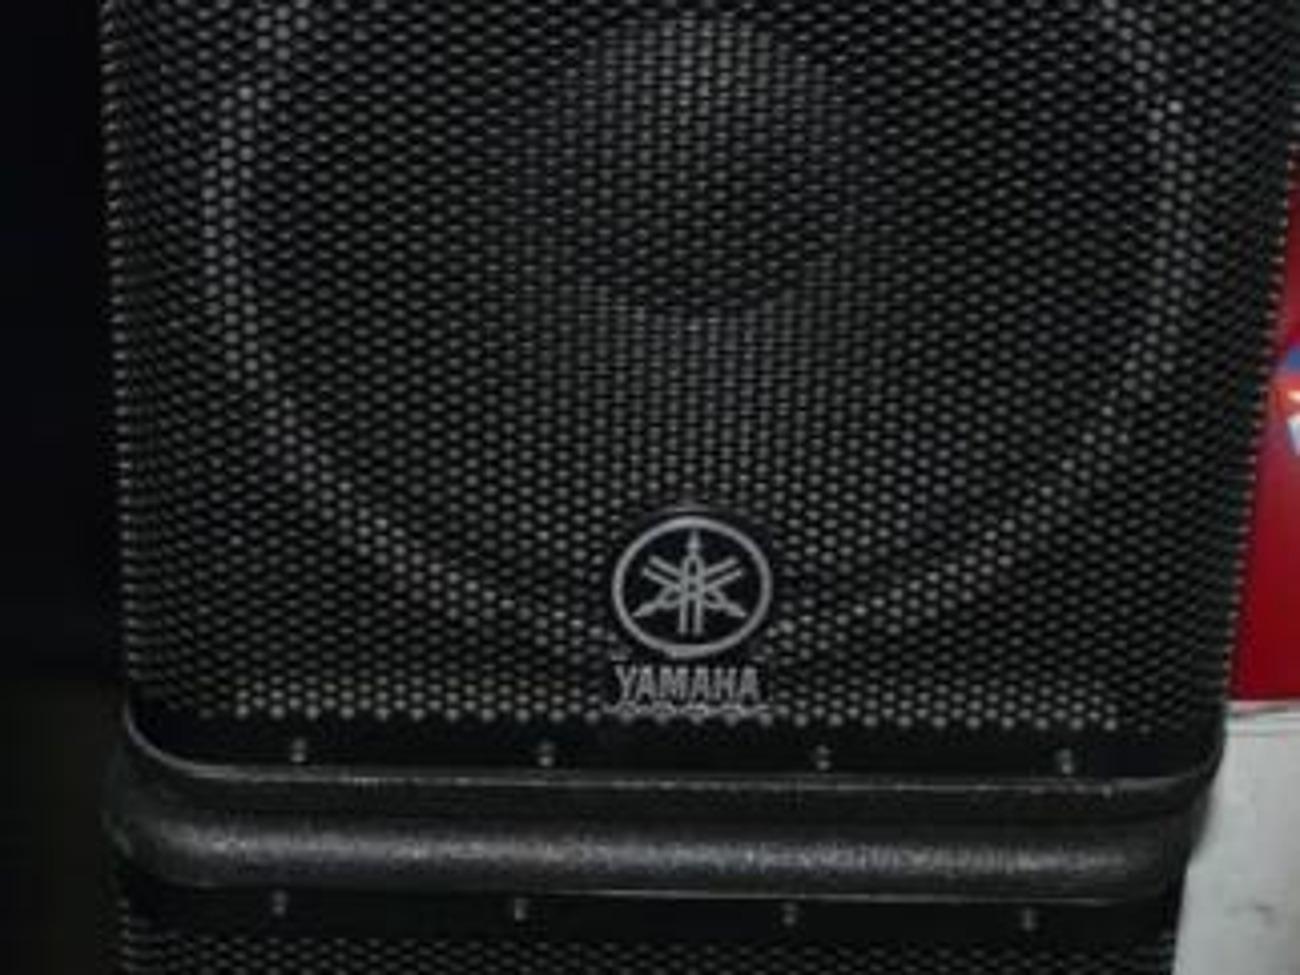 Yamaha DSR112 PA Live Sound DJ Speakers